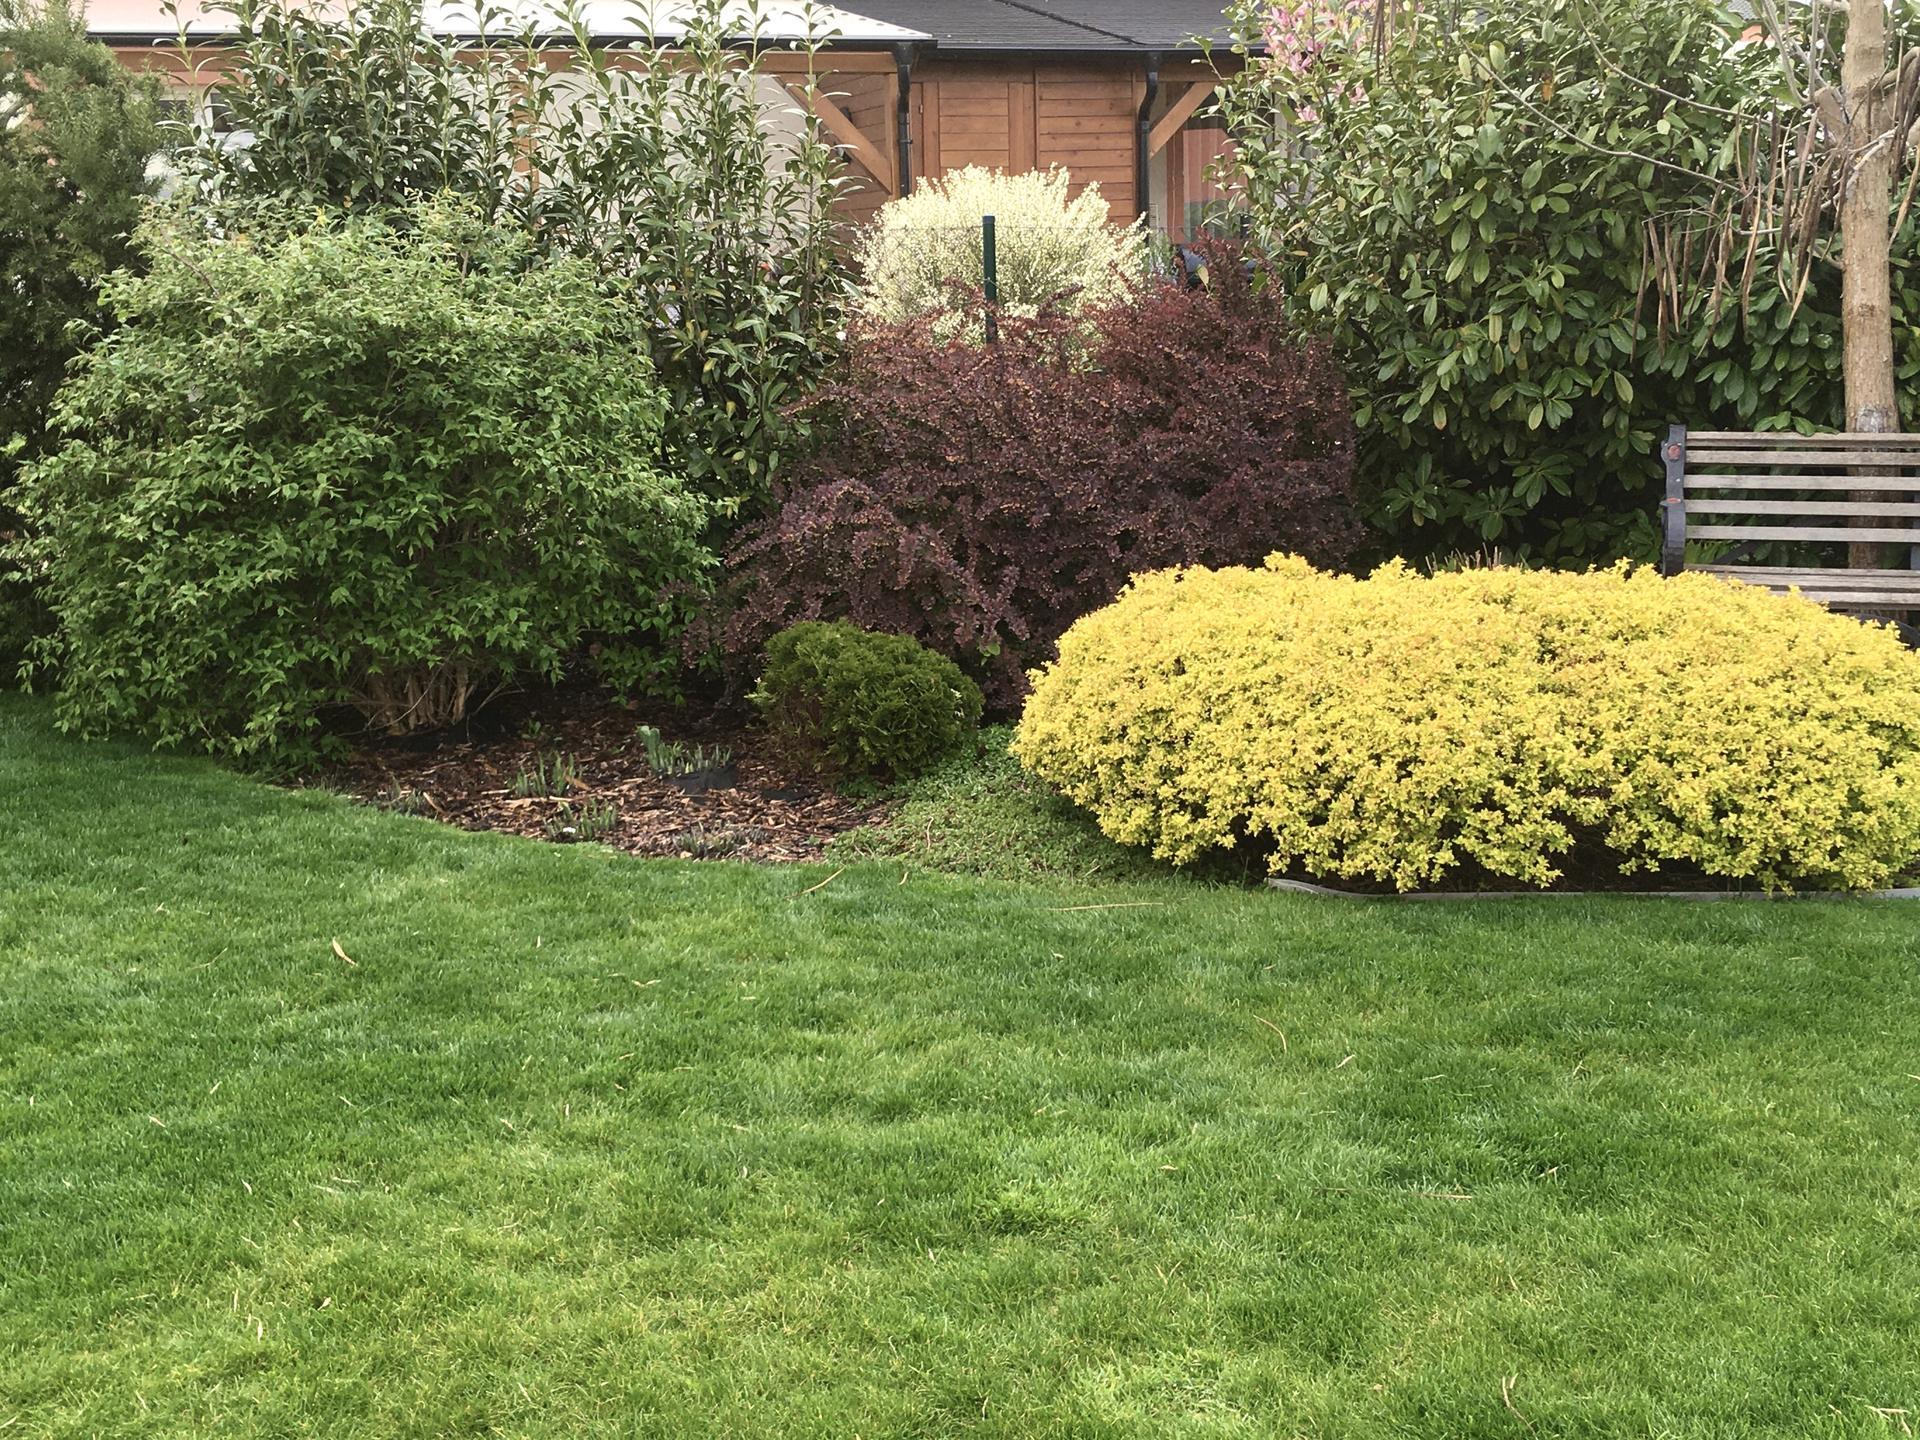 Zahrada 2020 - Ladime zahradu i se sousedy a vytvarime harmonicky celek nedbaje hranic pozemku 😃